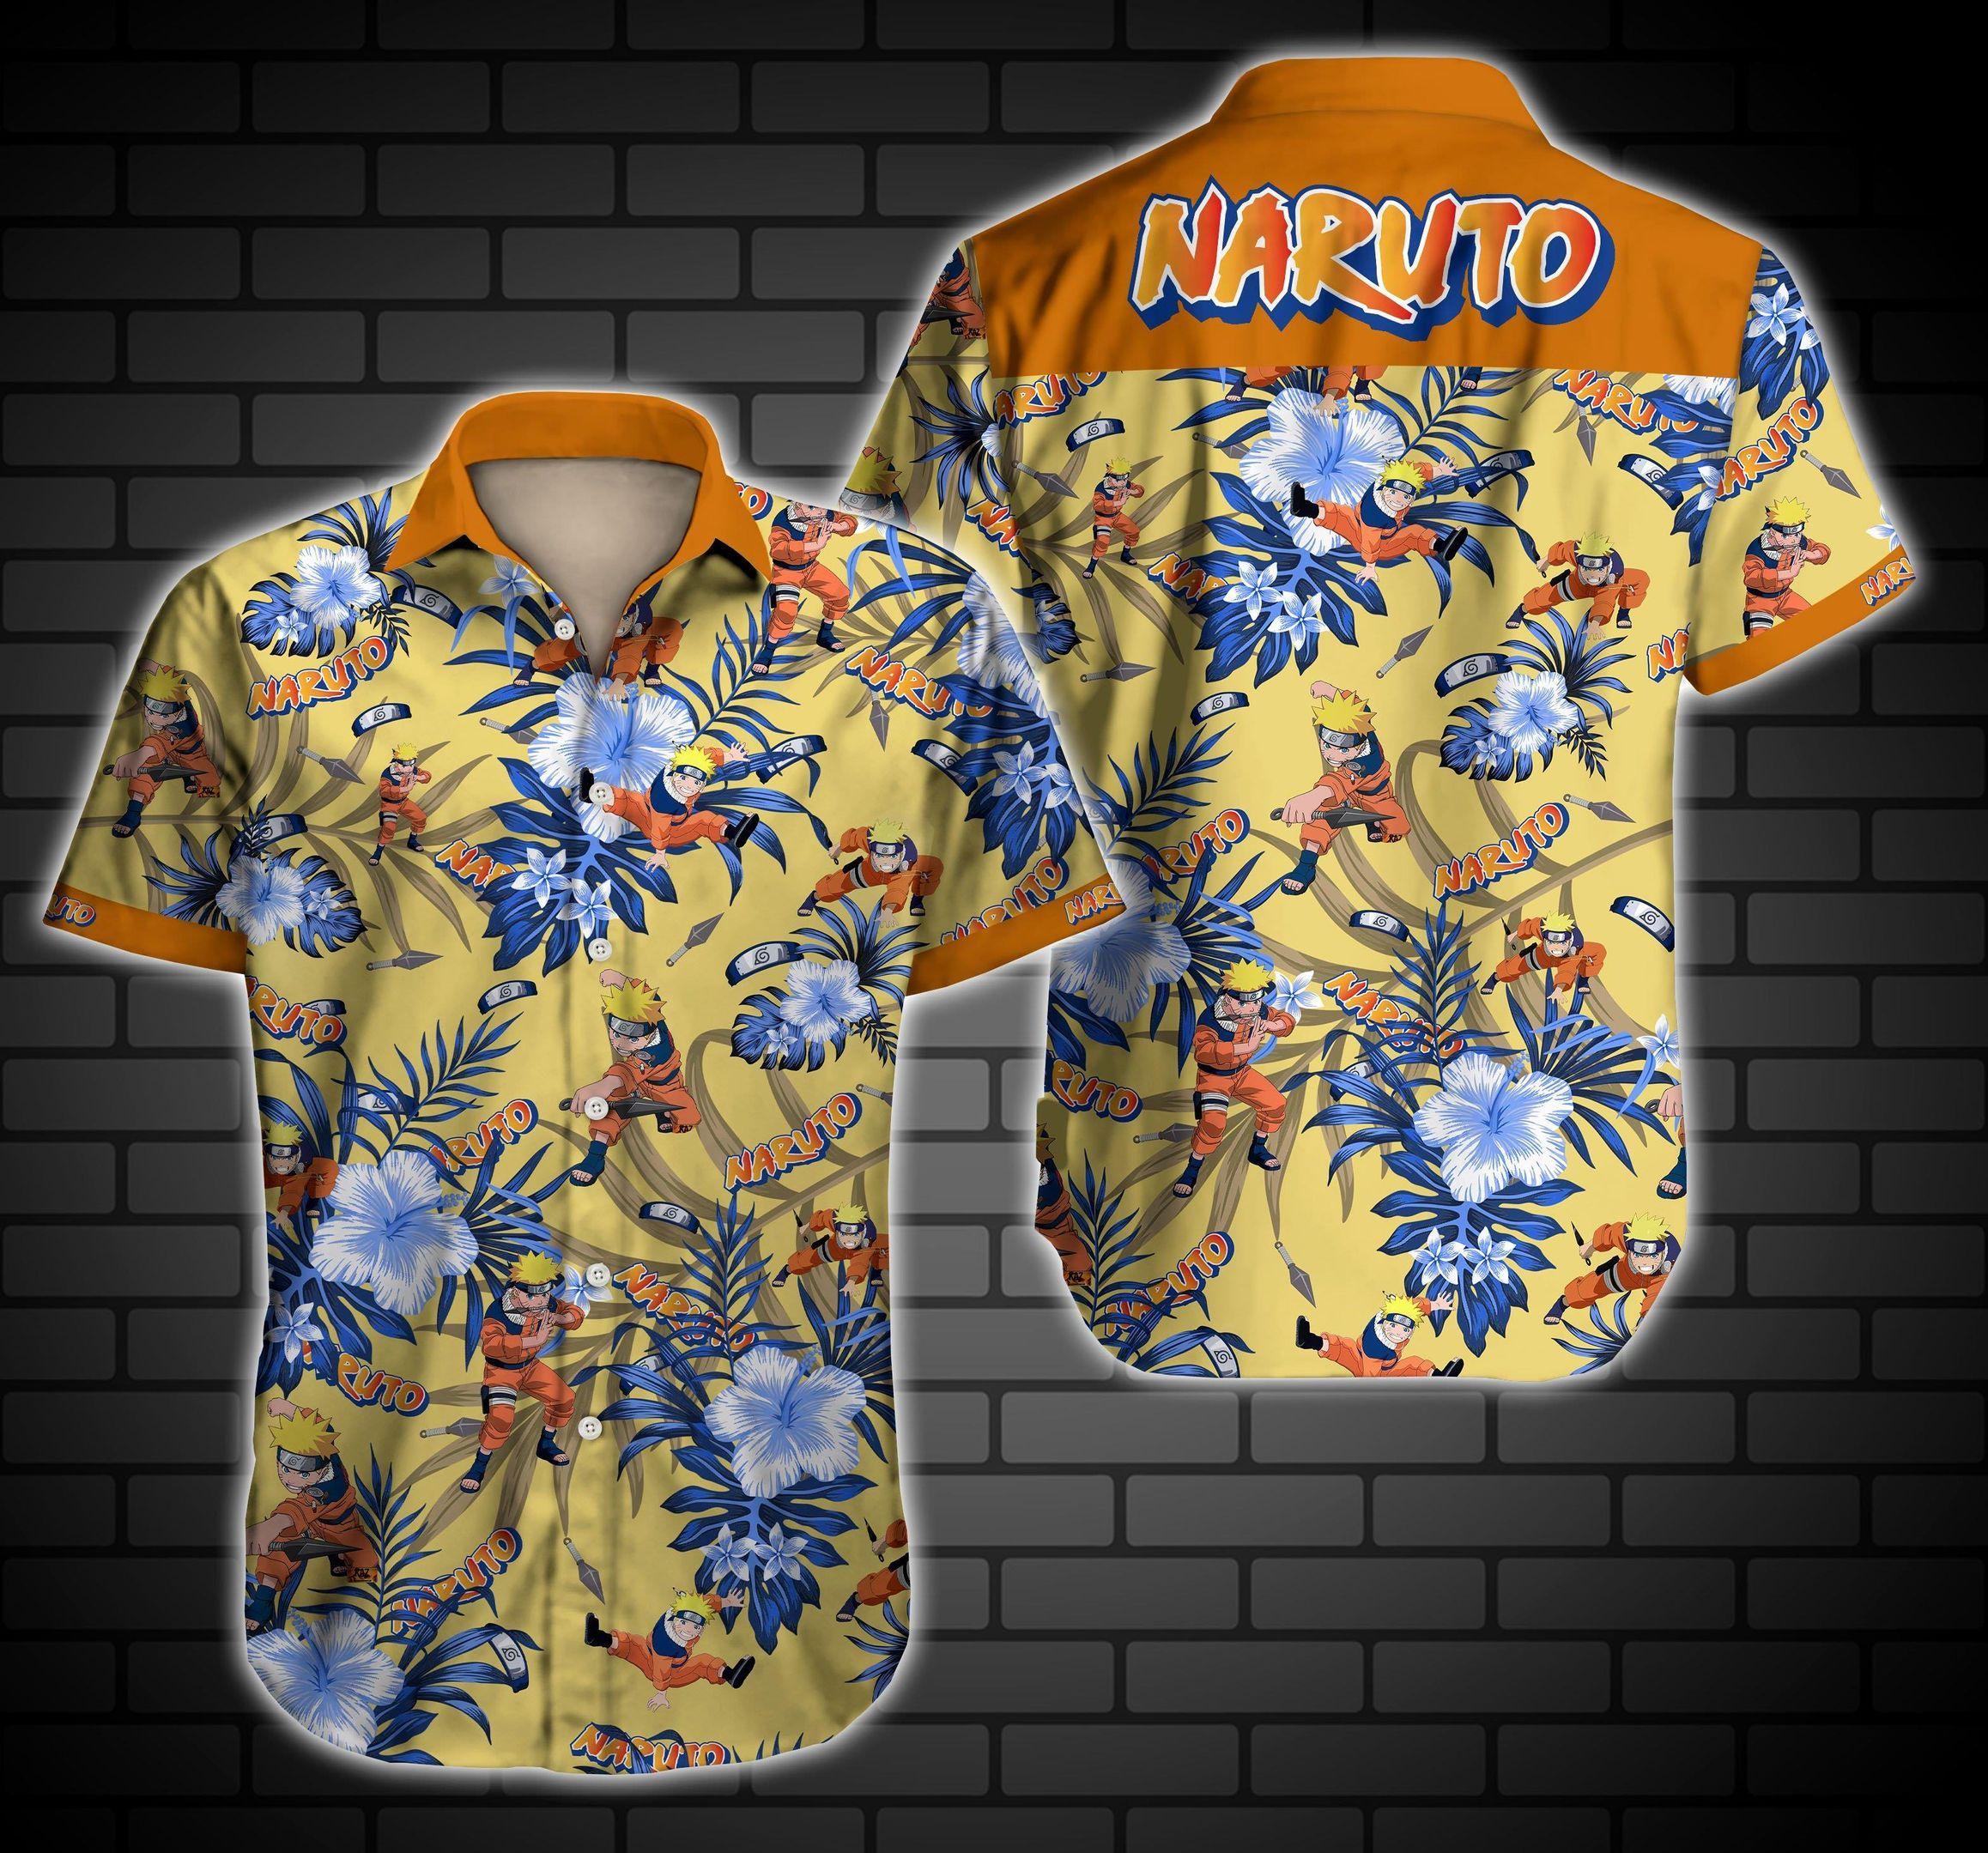 Naruto Hawaiian Shirt Summer Shirt